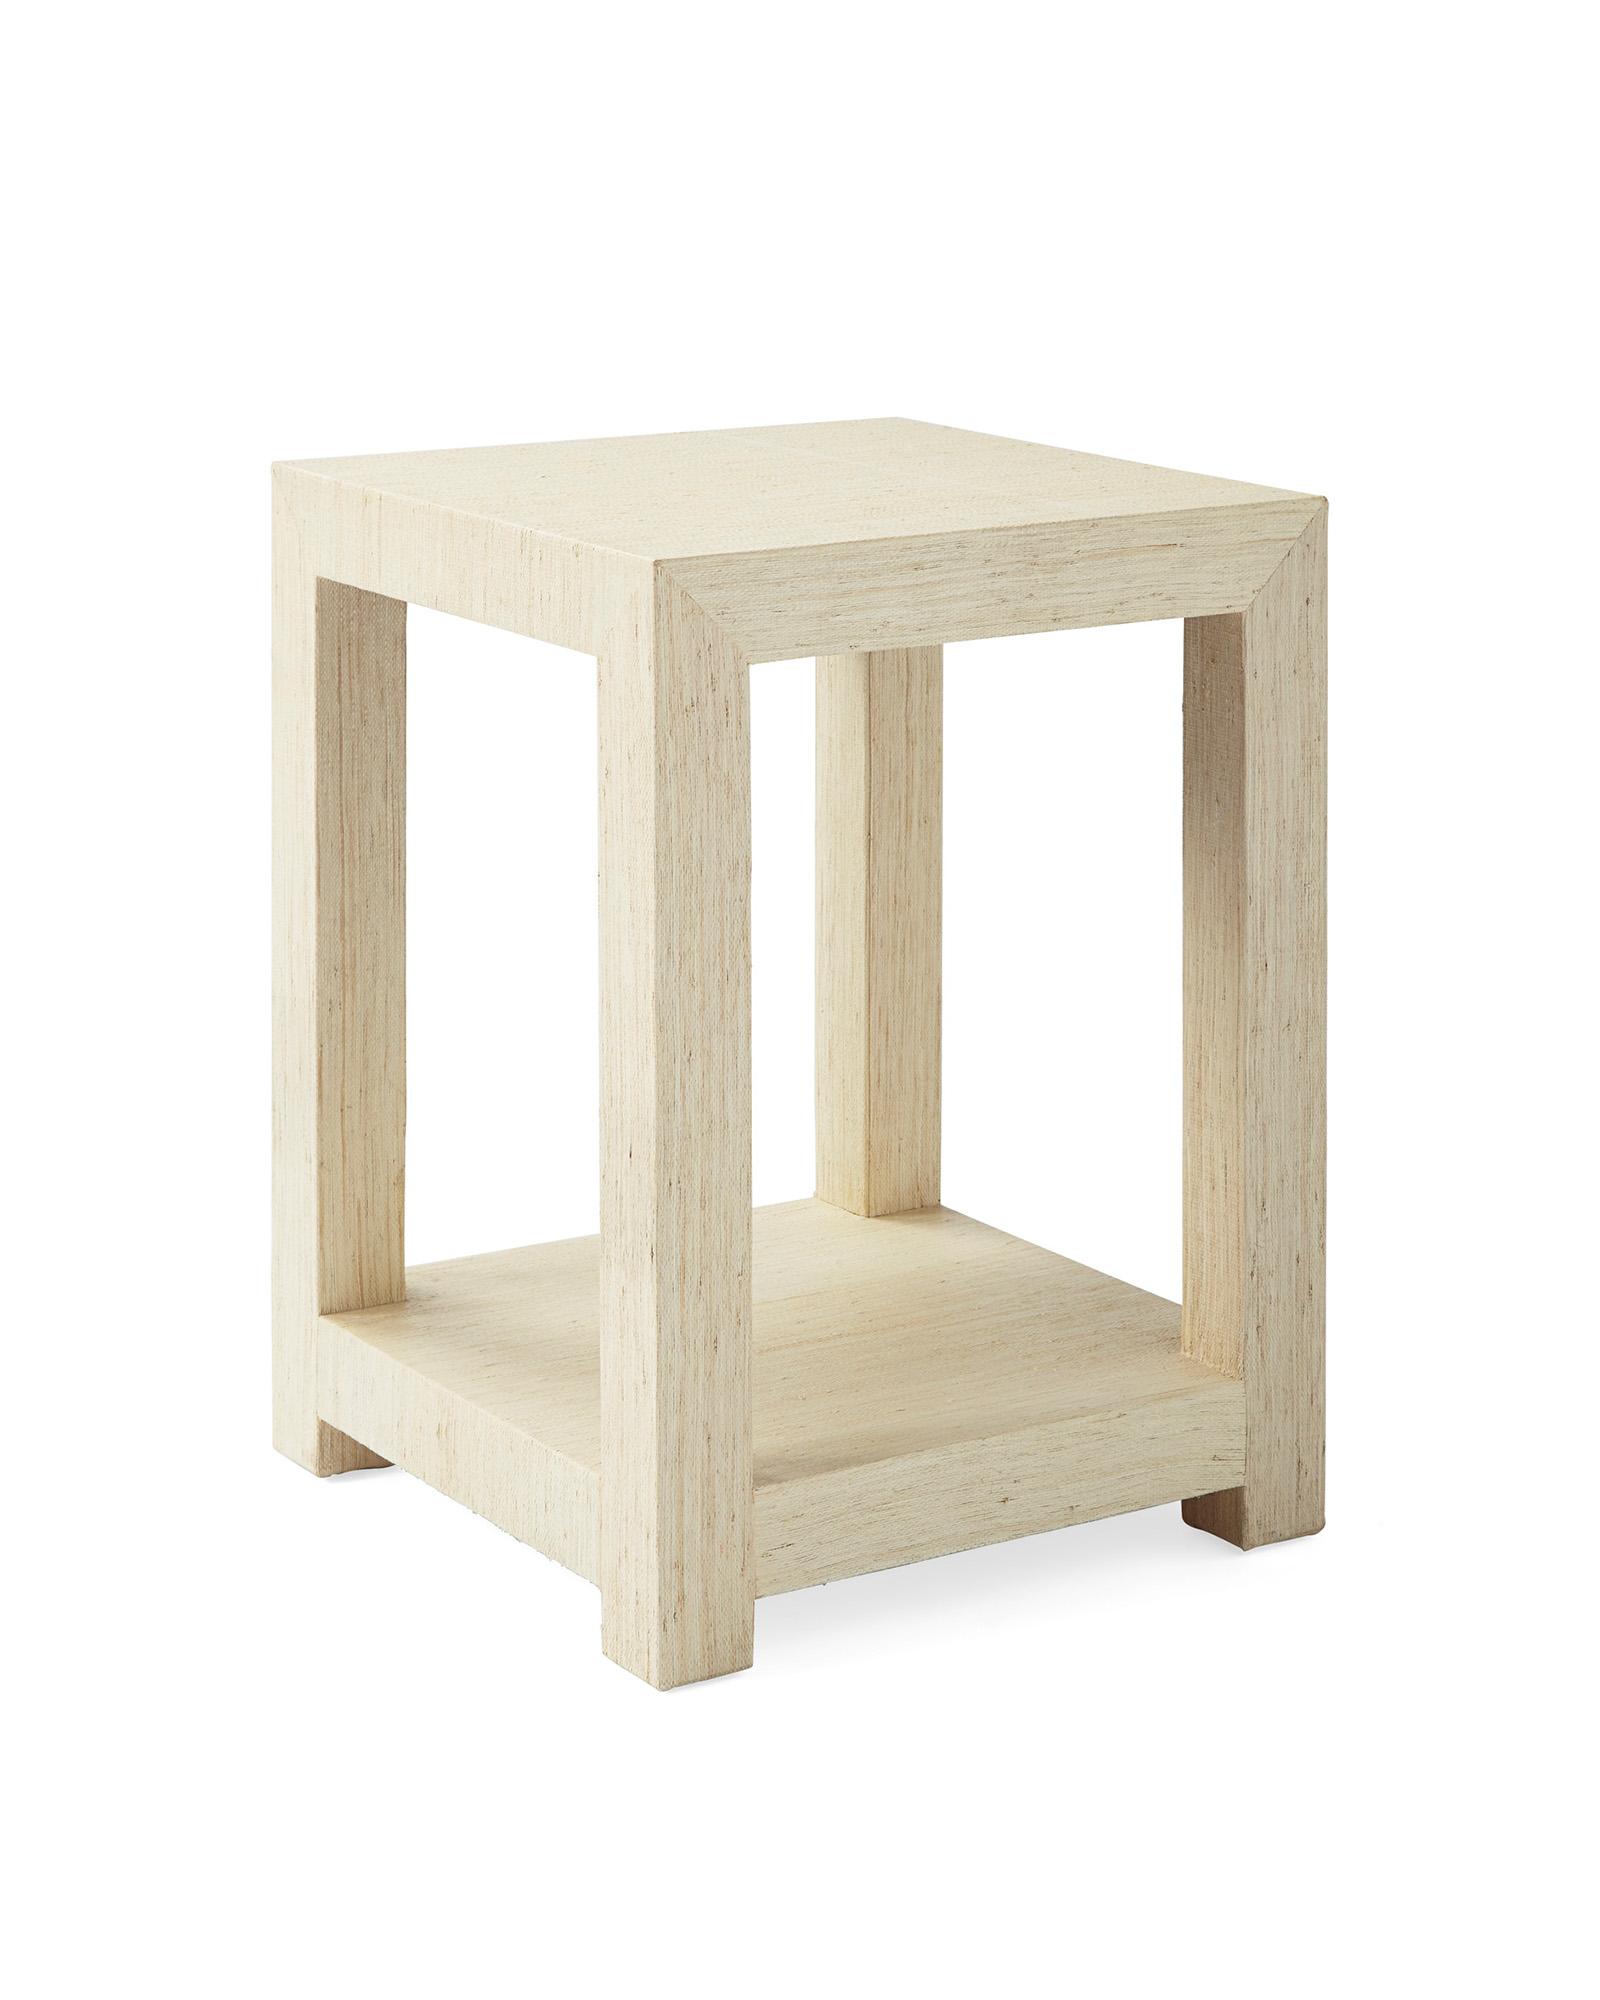 Furn_Blake_Side_Table_Without_Drawer_Natural_Angle_MV_0145_Crop_SH.jpg